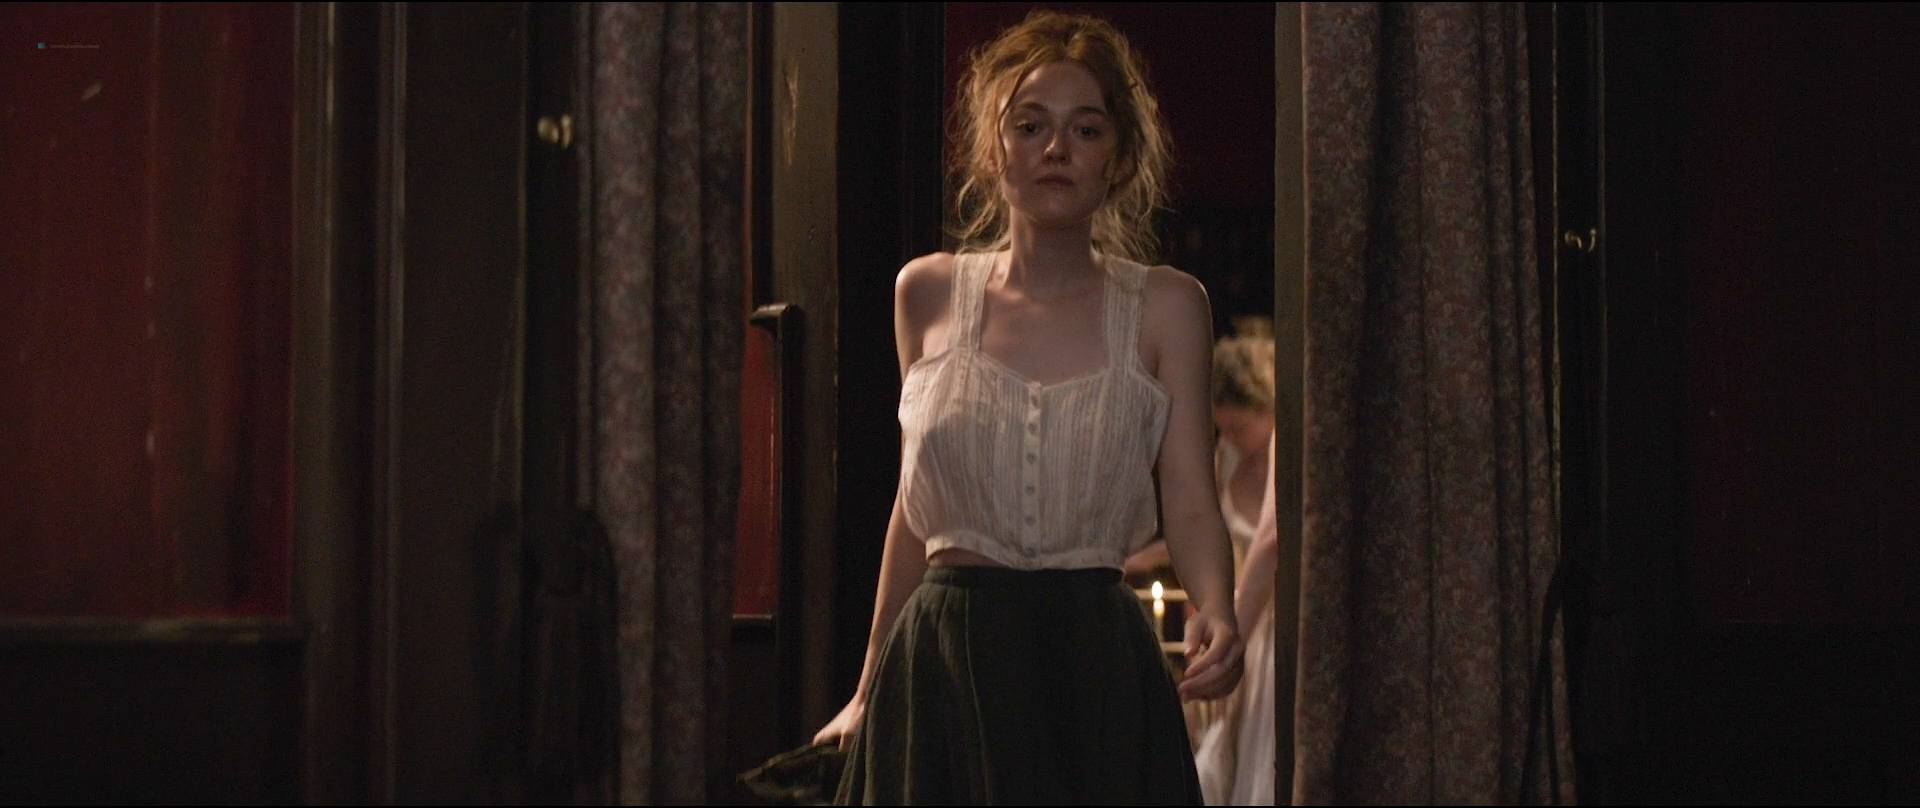 Dakota Fanning hot, Carla Juri, Vera Vitali others nude bush - Brimstone (2016) HD 1080p BluRay (15)